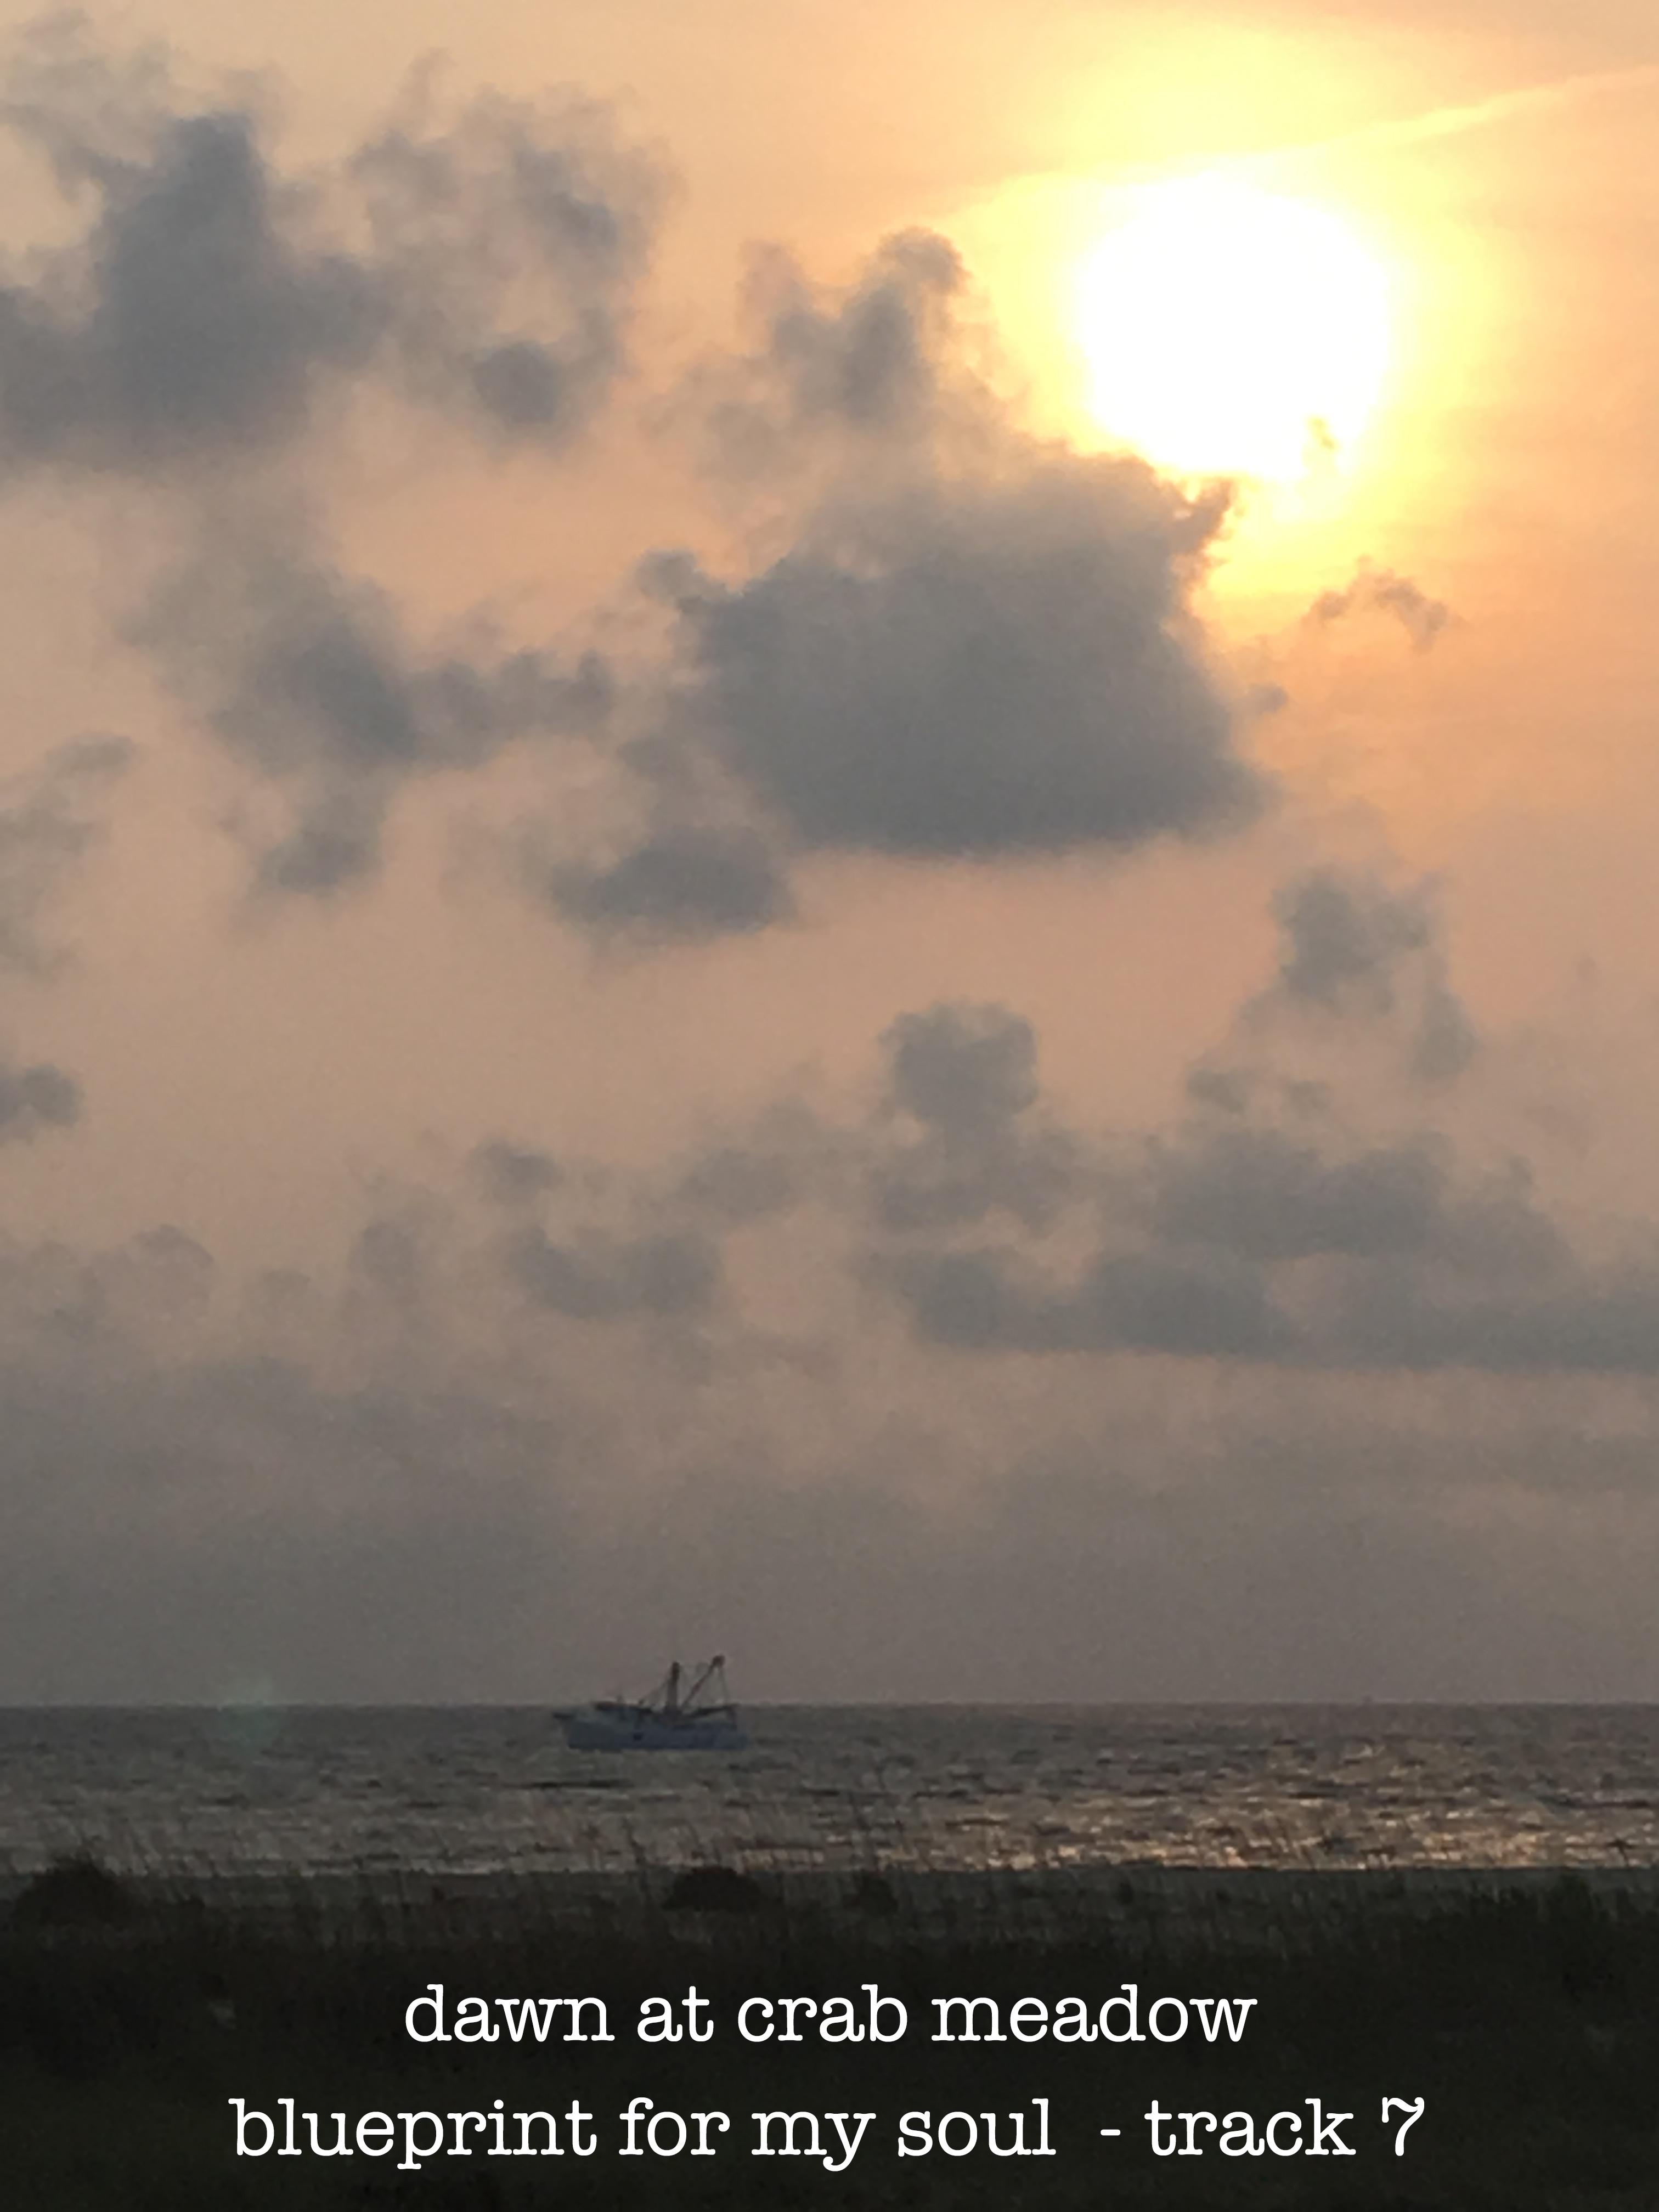 dawn at crab meadow songbox copy